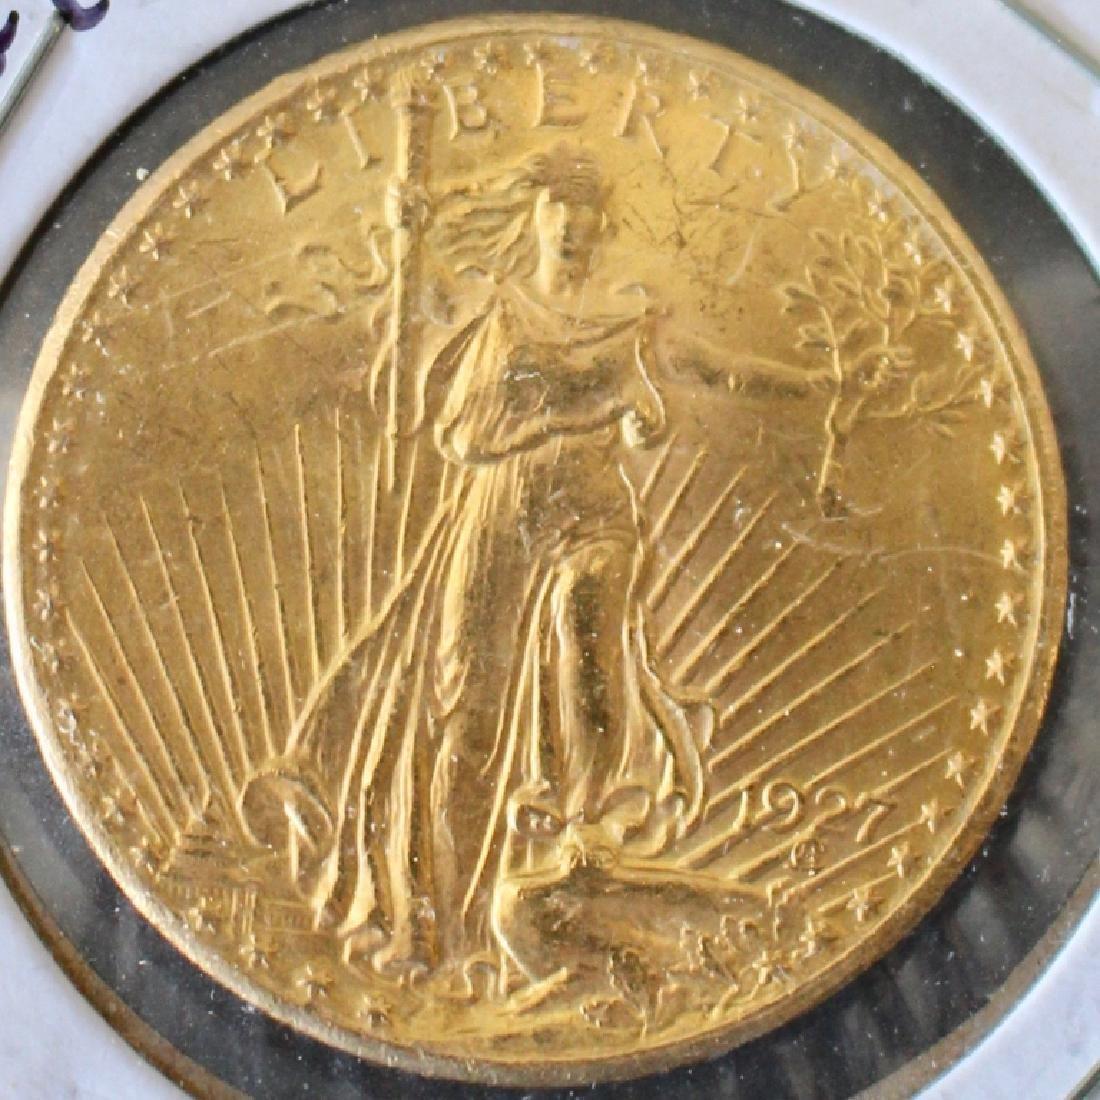 1927 St. Gaudens US $20 Gold Coin